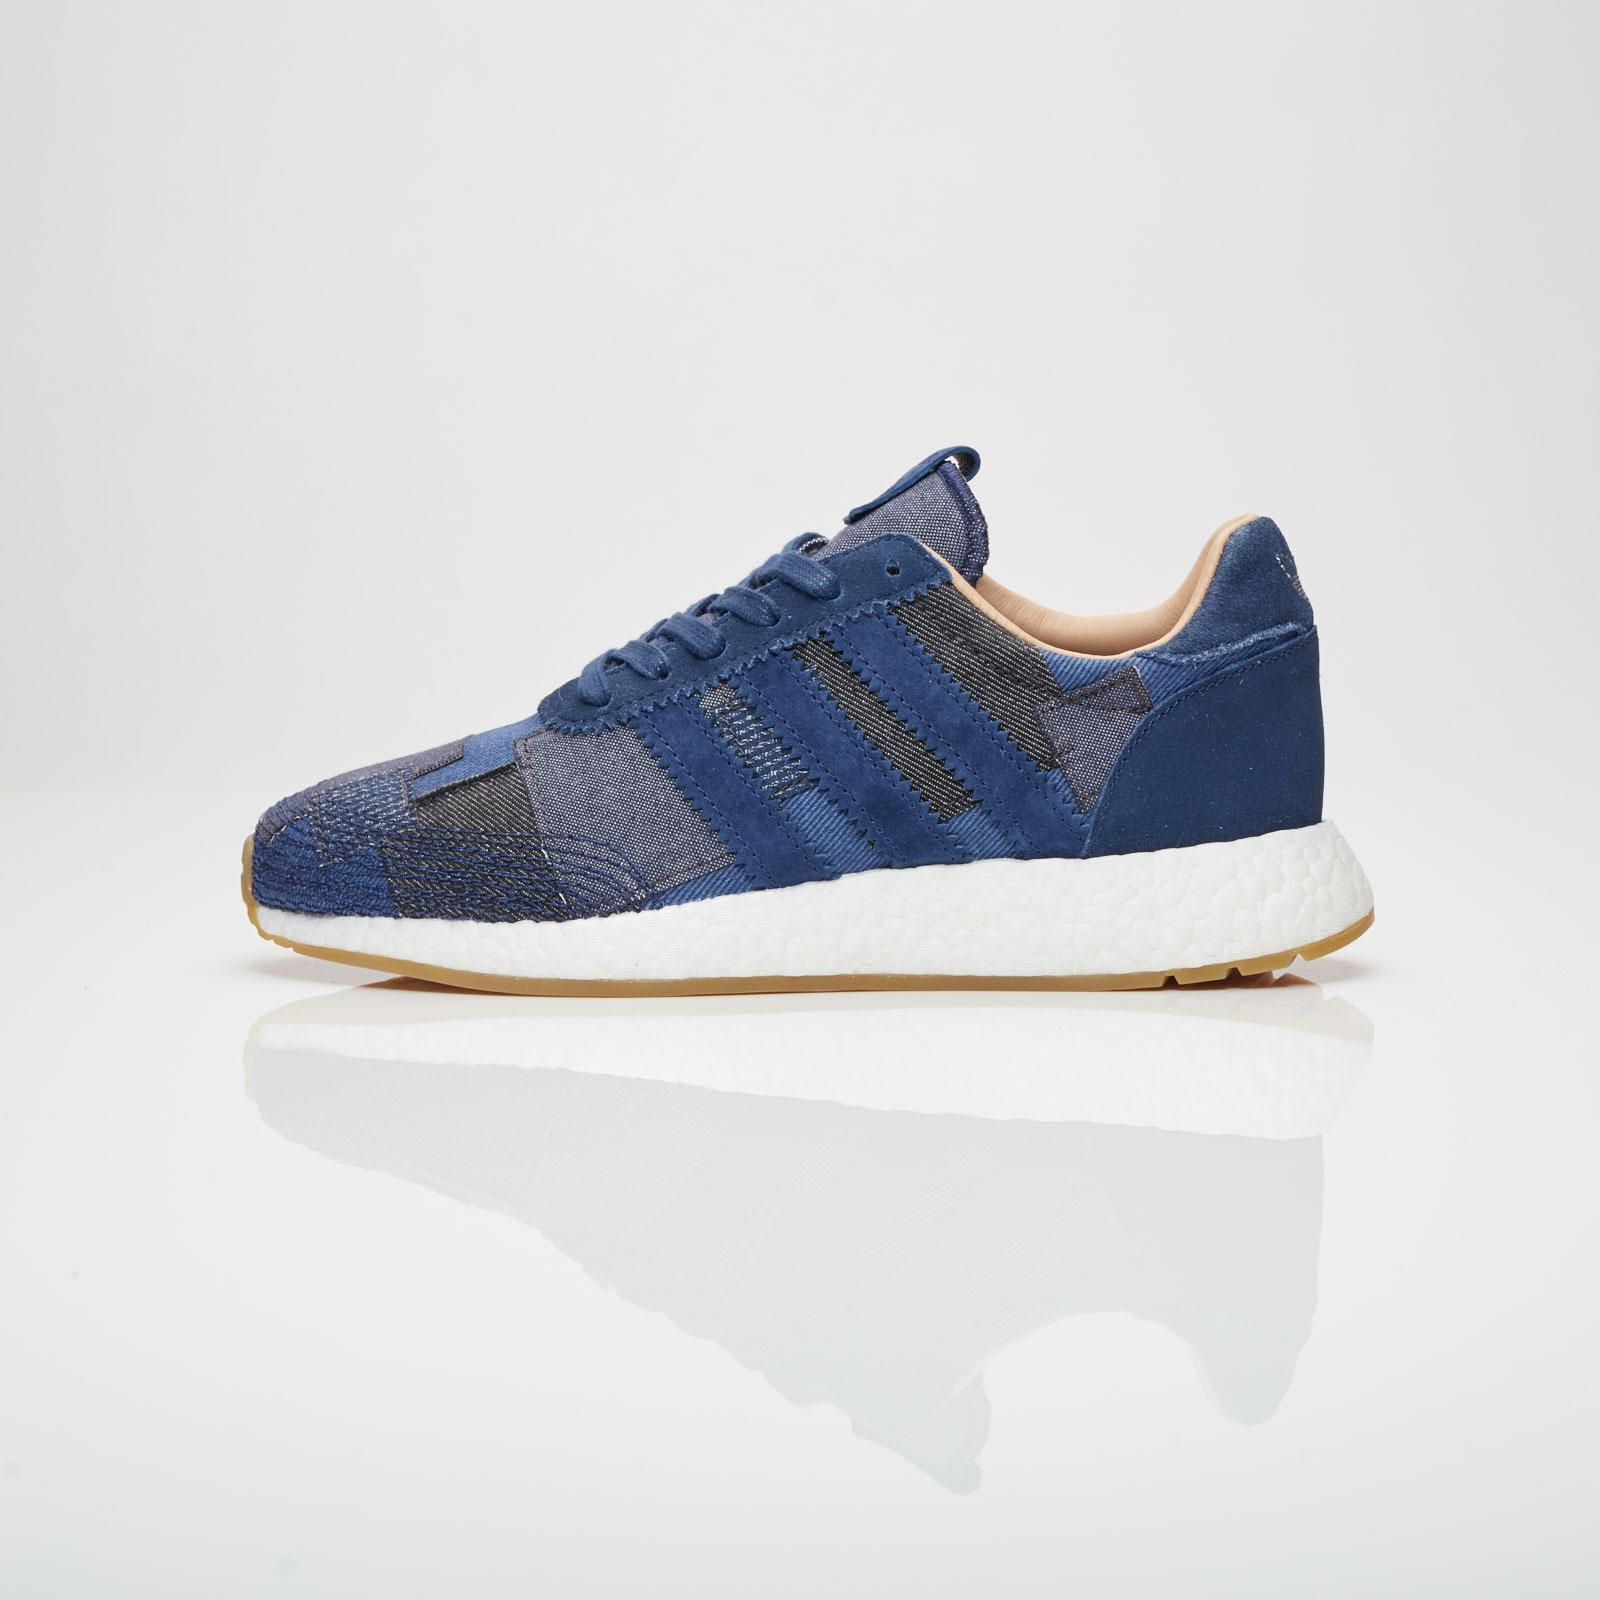 38f53921232a adidas Iniki Runner End x Bodega SE - By2104 - Sneakersnstuff ...